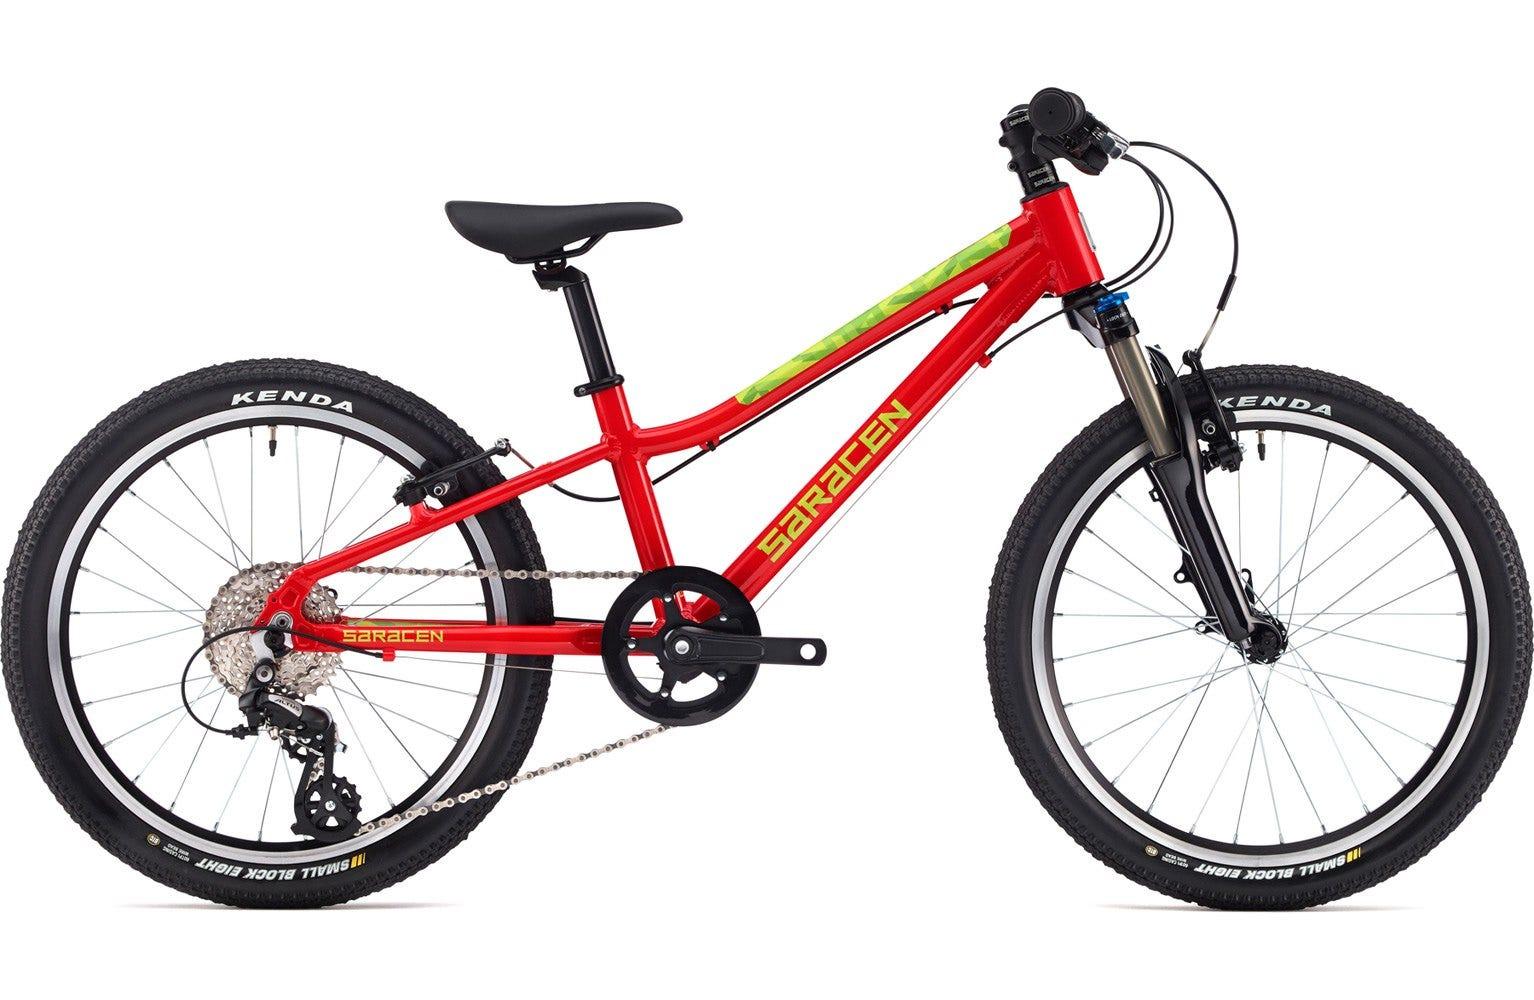 Saracen Mantra 2.0 bike